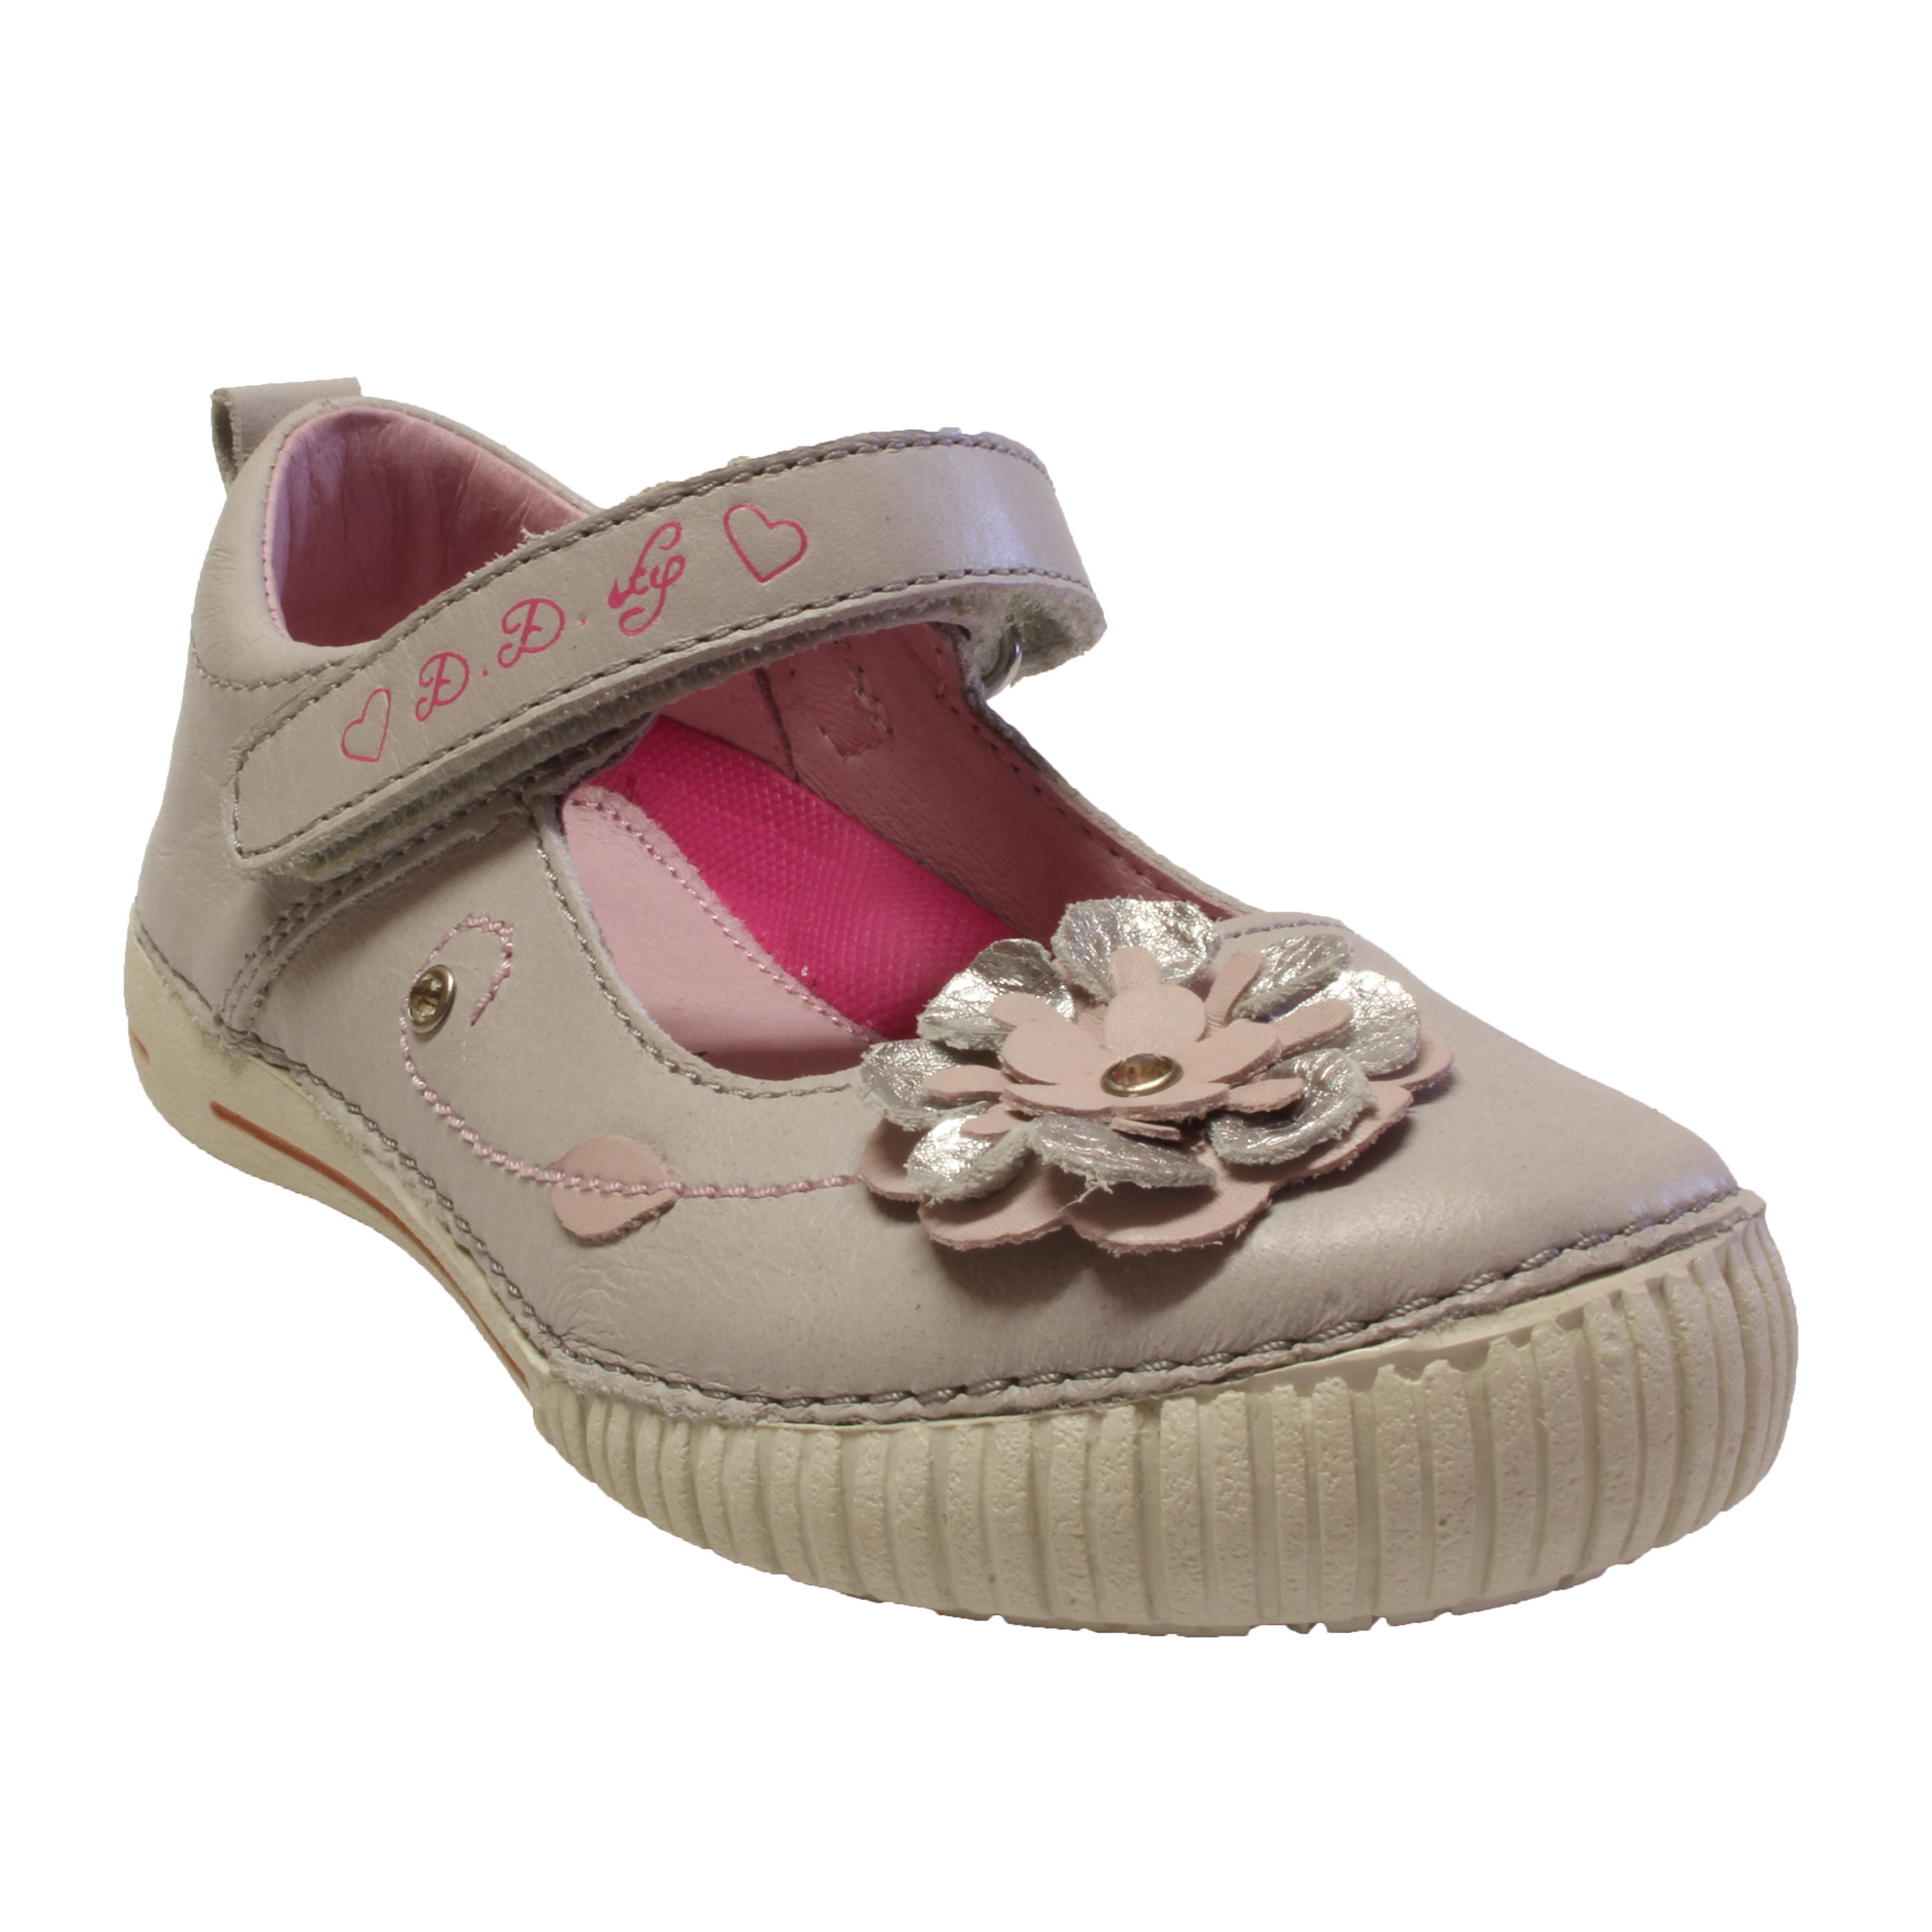 15699102c0 D.D. Step lány tavaszi bőr cipő 036-46L   Jager Shoes